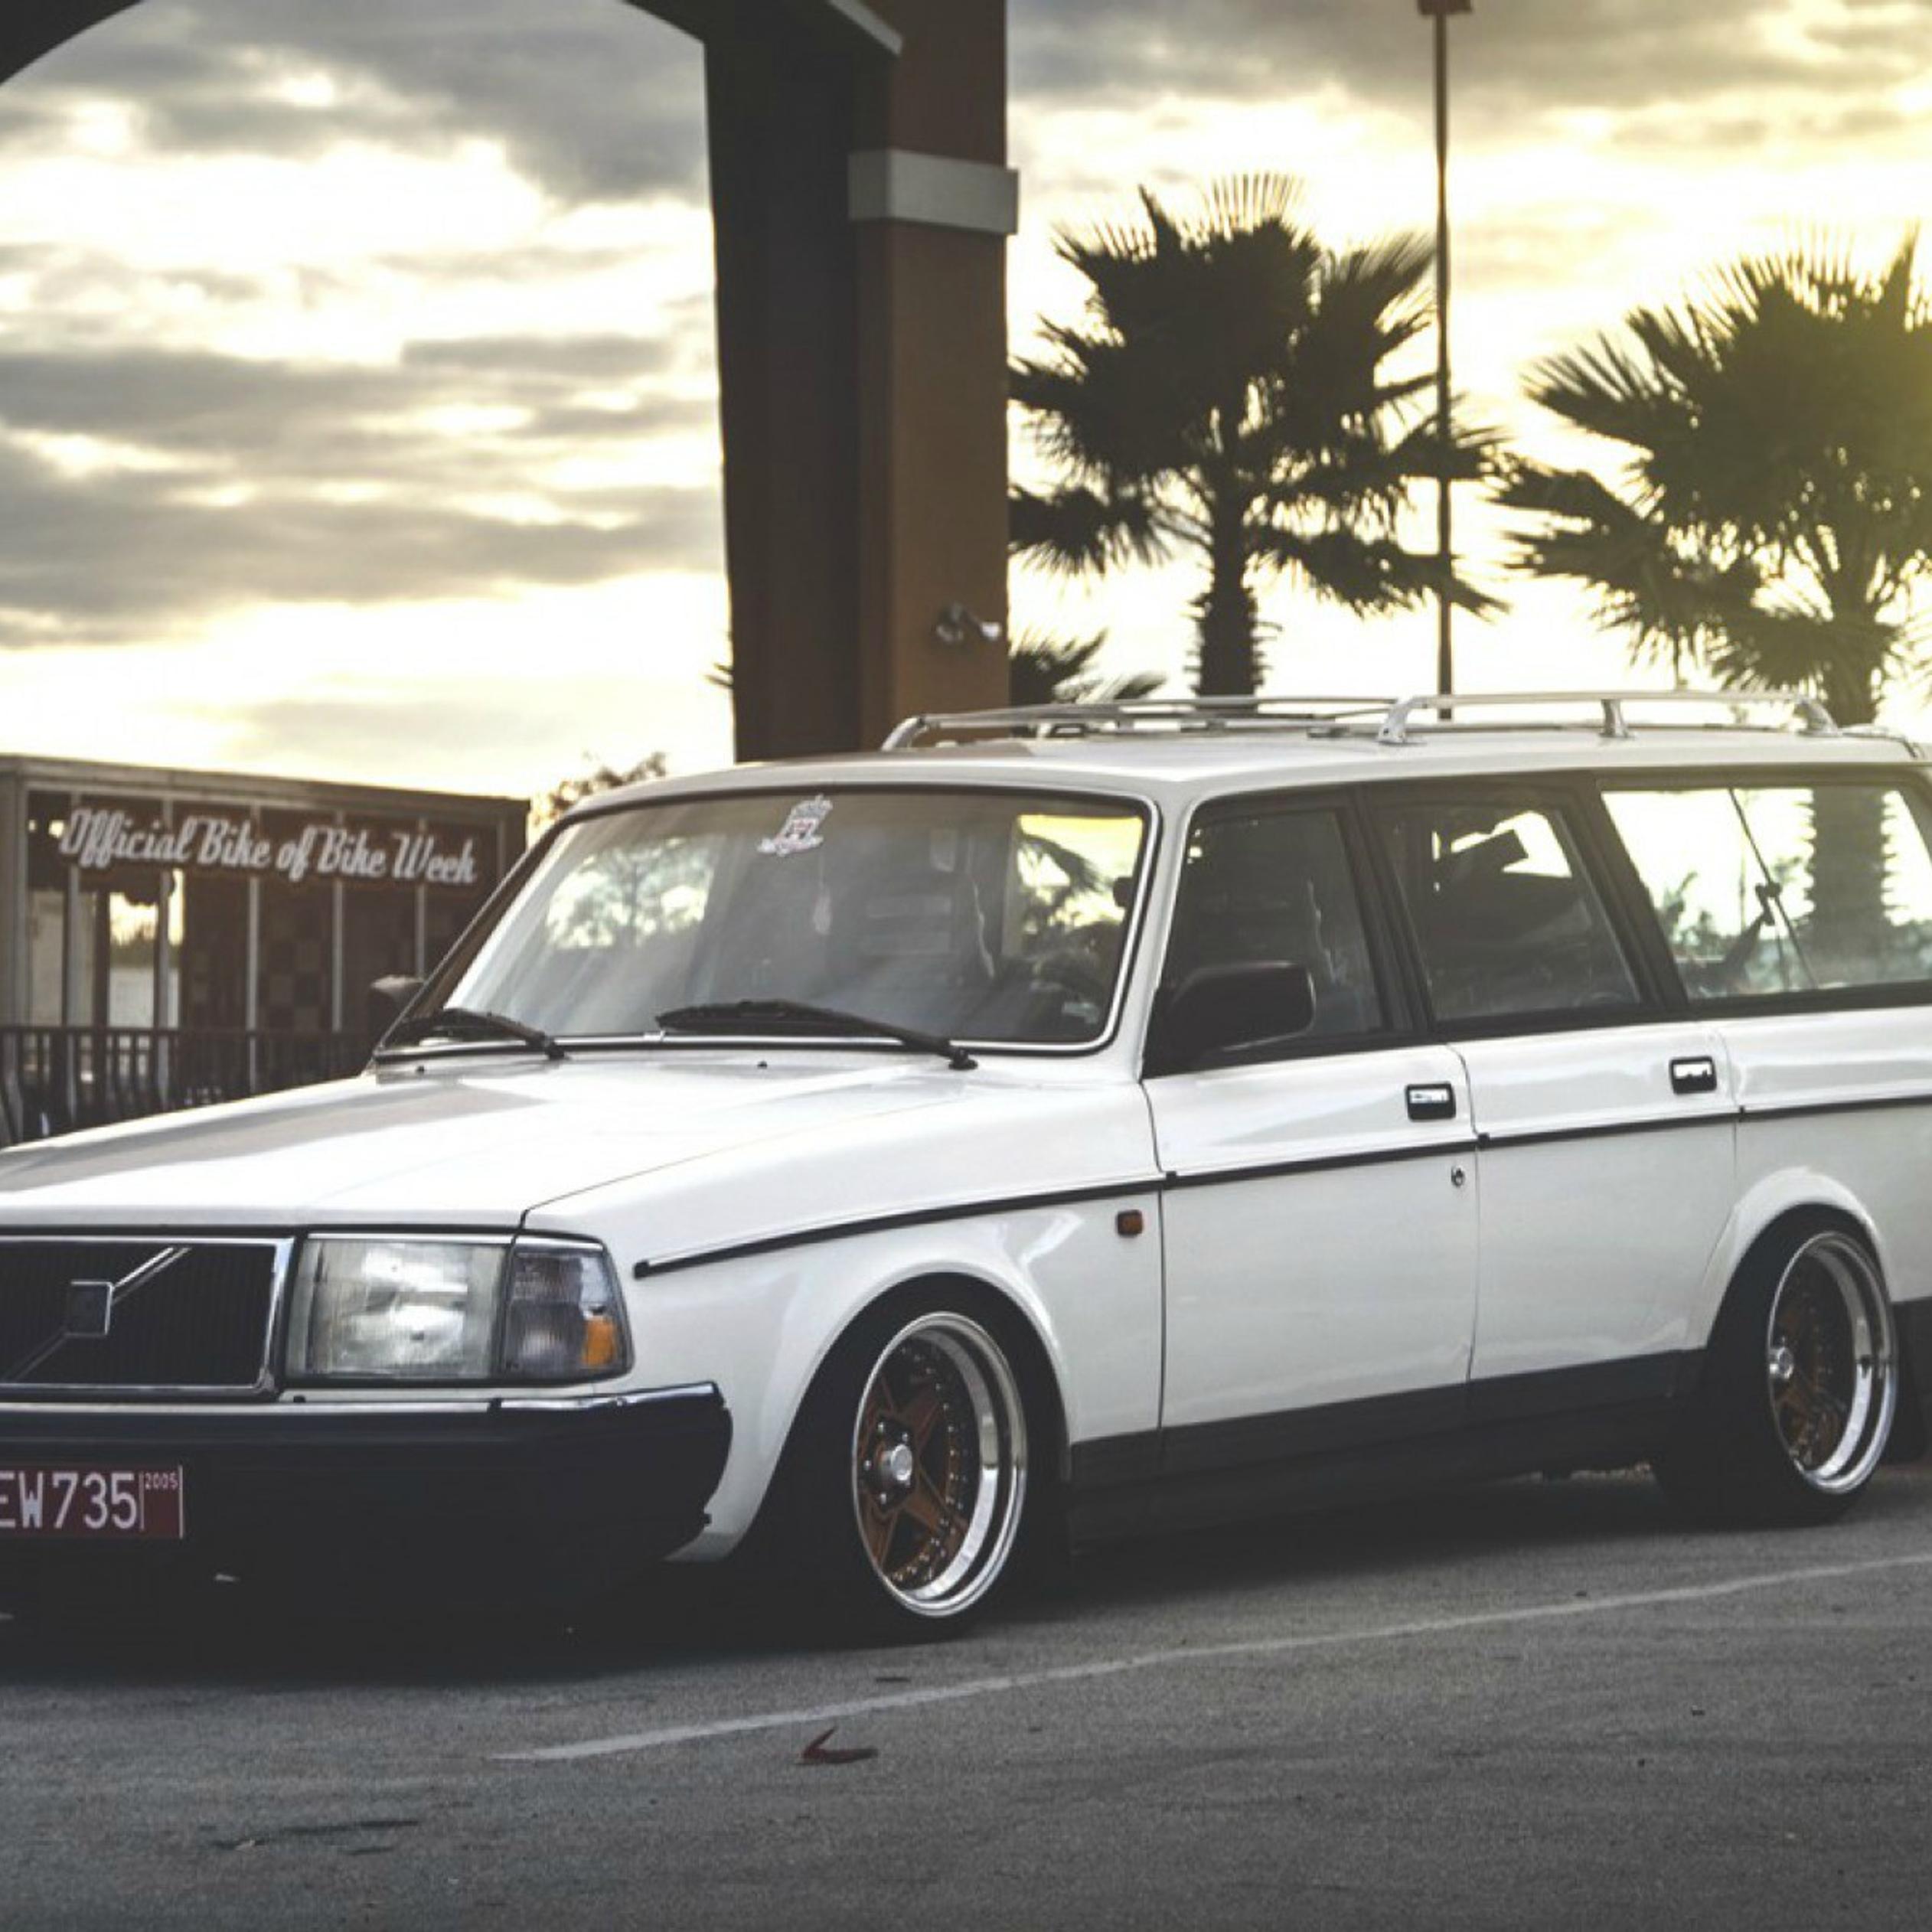 Old White Volvo 200 Wagon Wallpaper Download 2524x2524